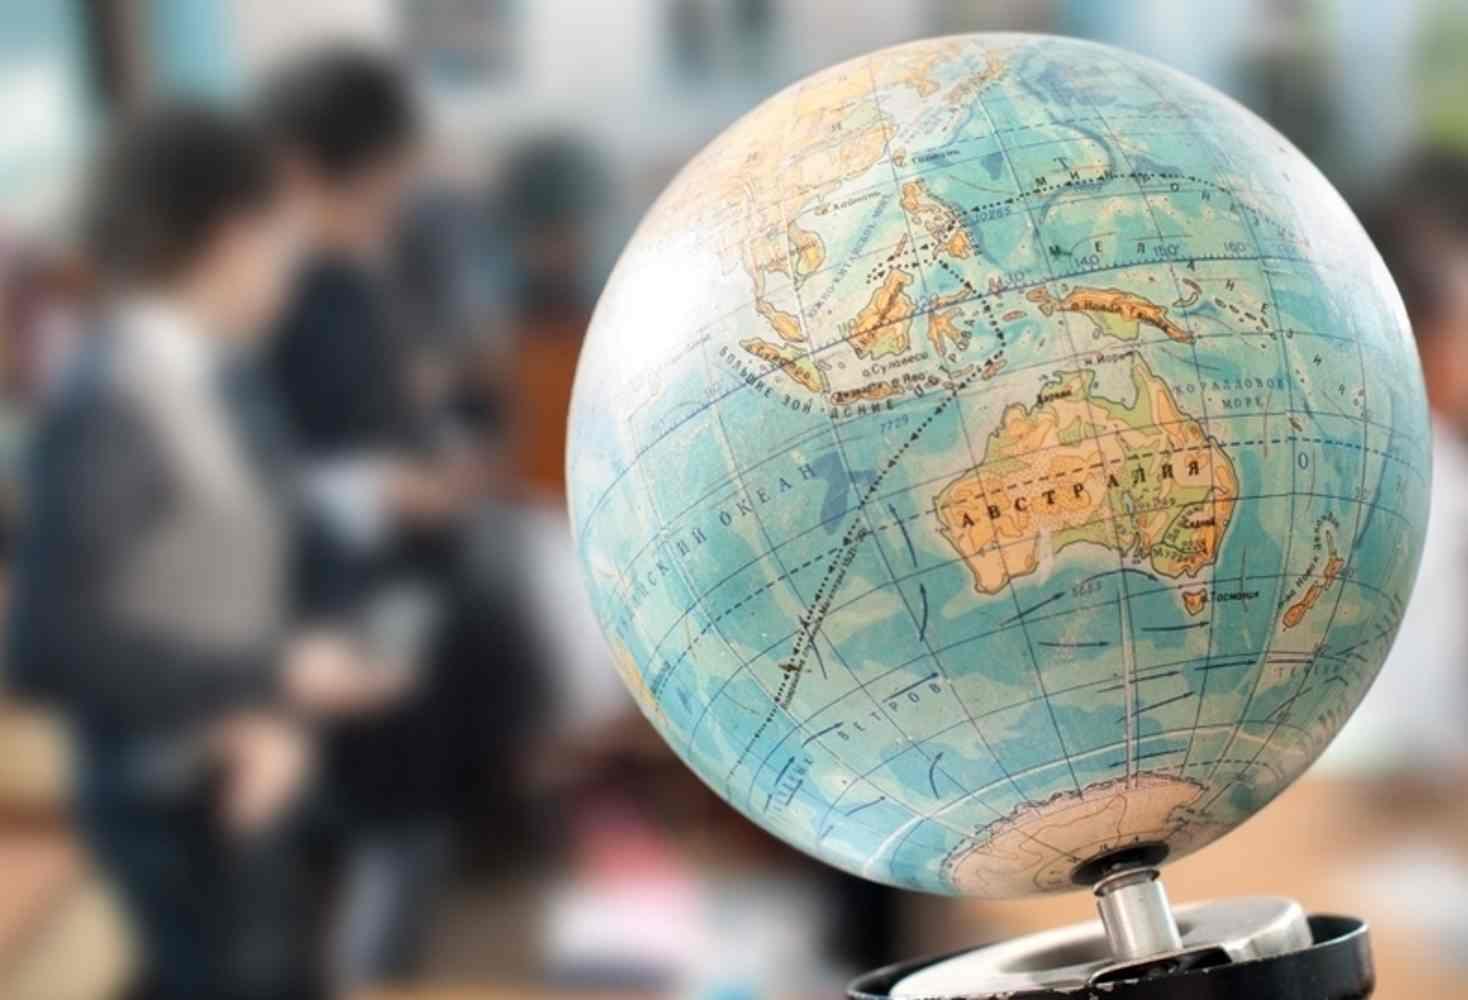 kak-uspeshno-sdat-ege-po-geografii-rekomendatsii-ot-razrabotchikov-ekzamena